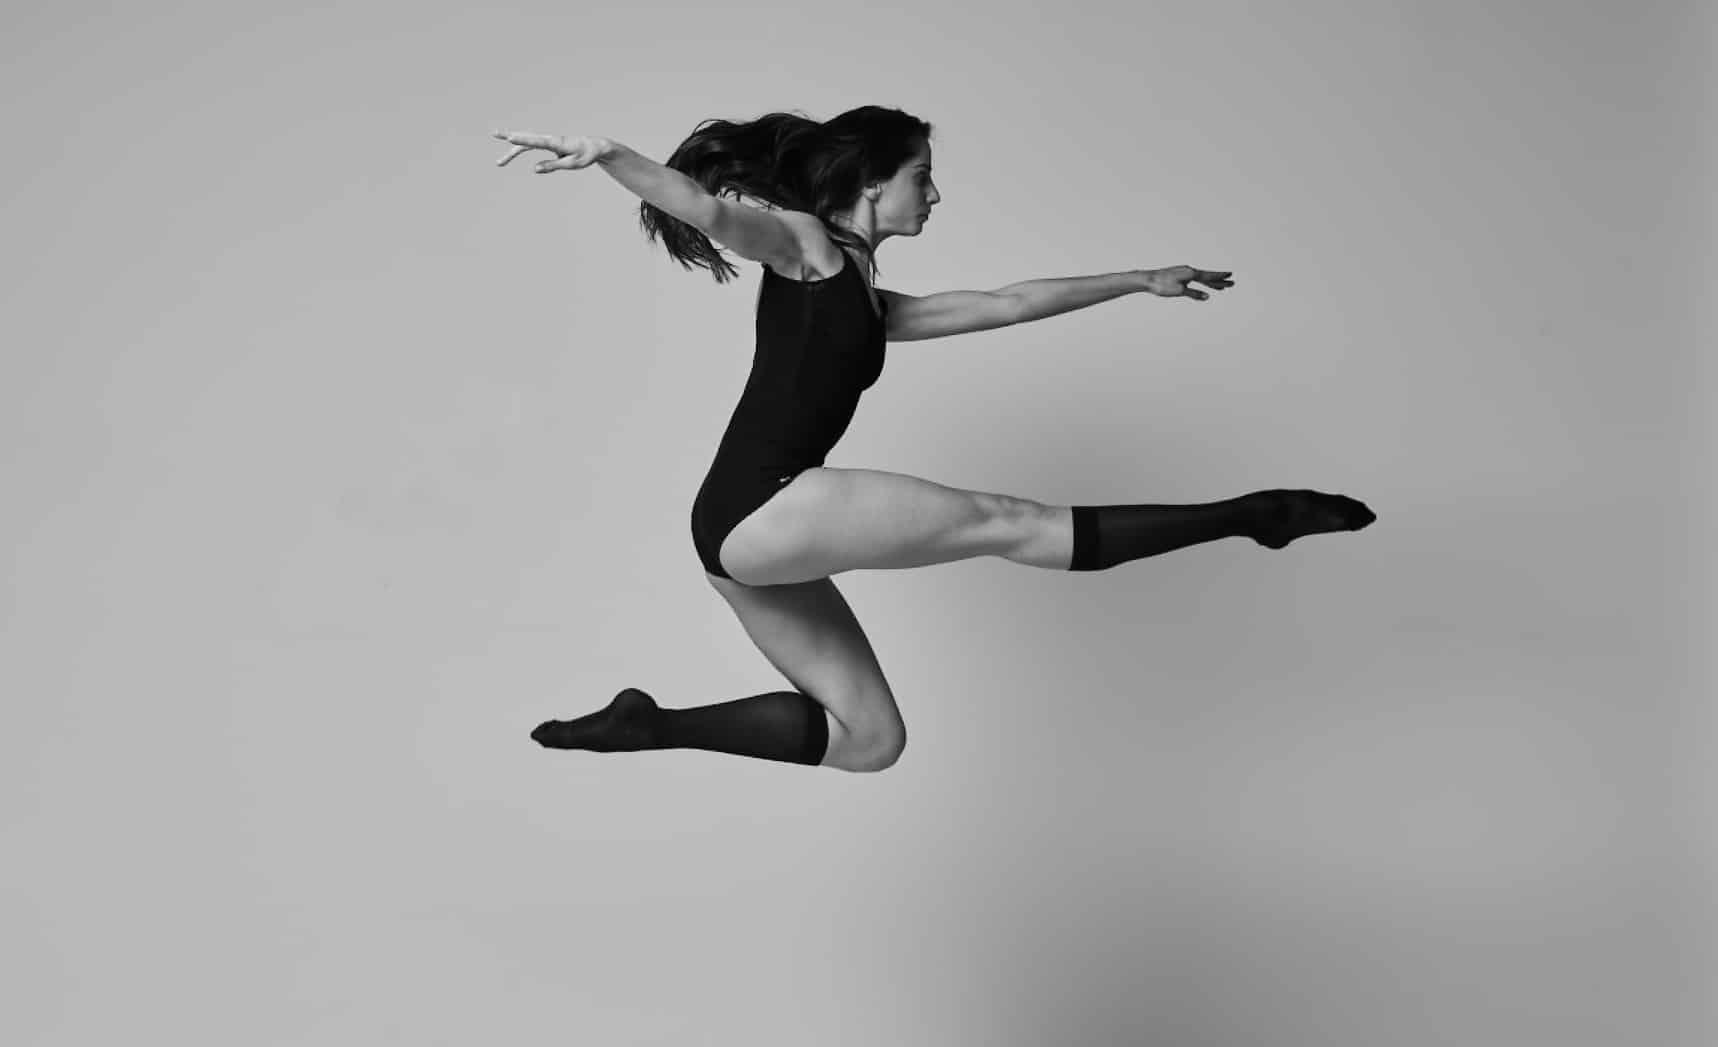 dancer black and whit wearing compression socks